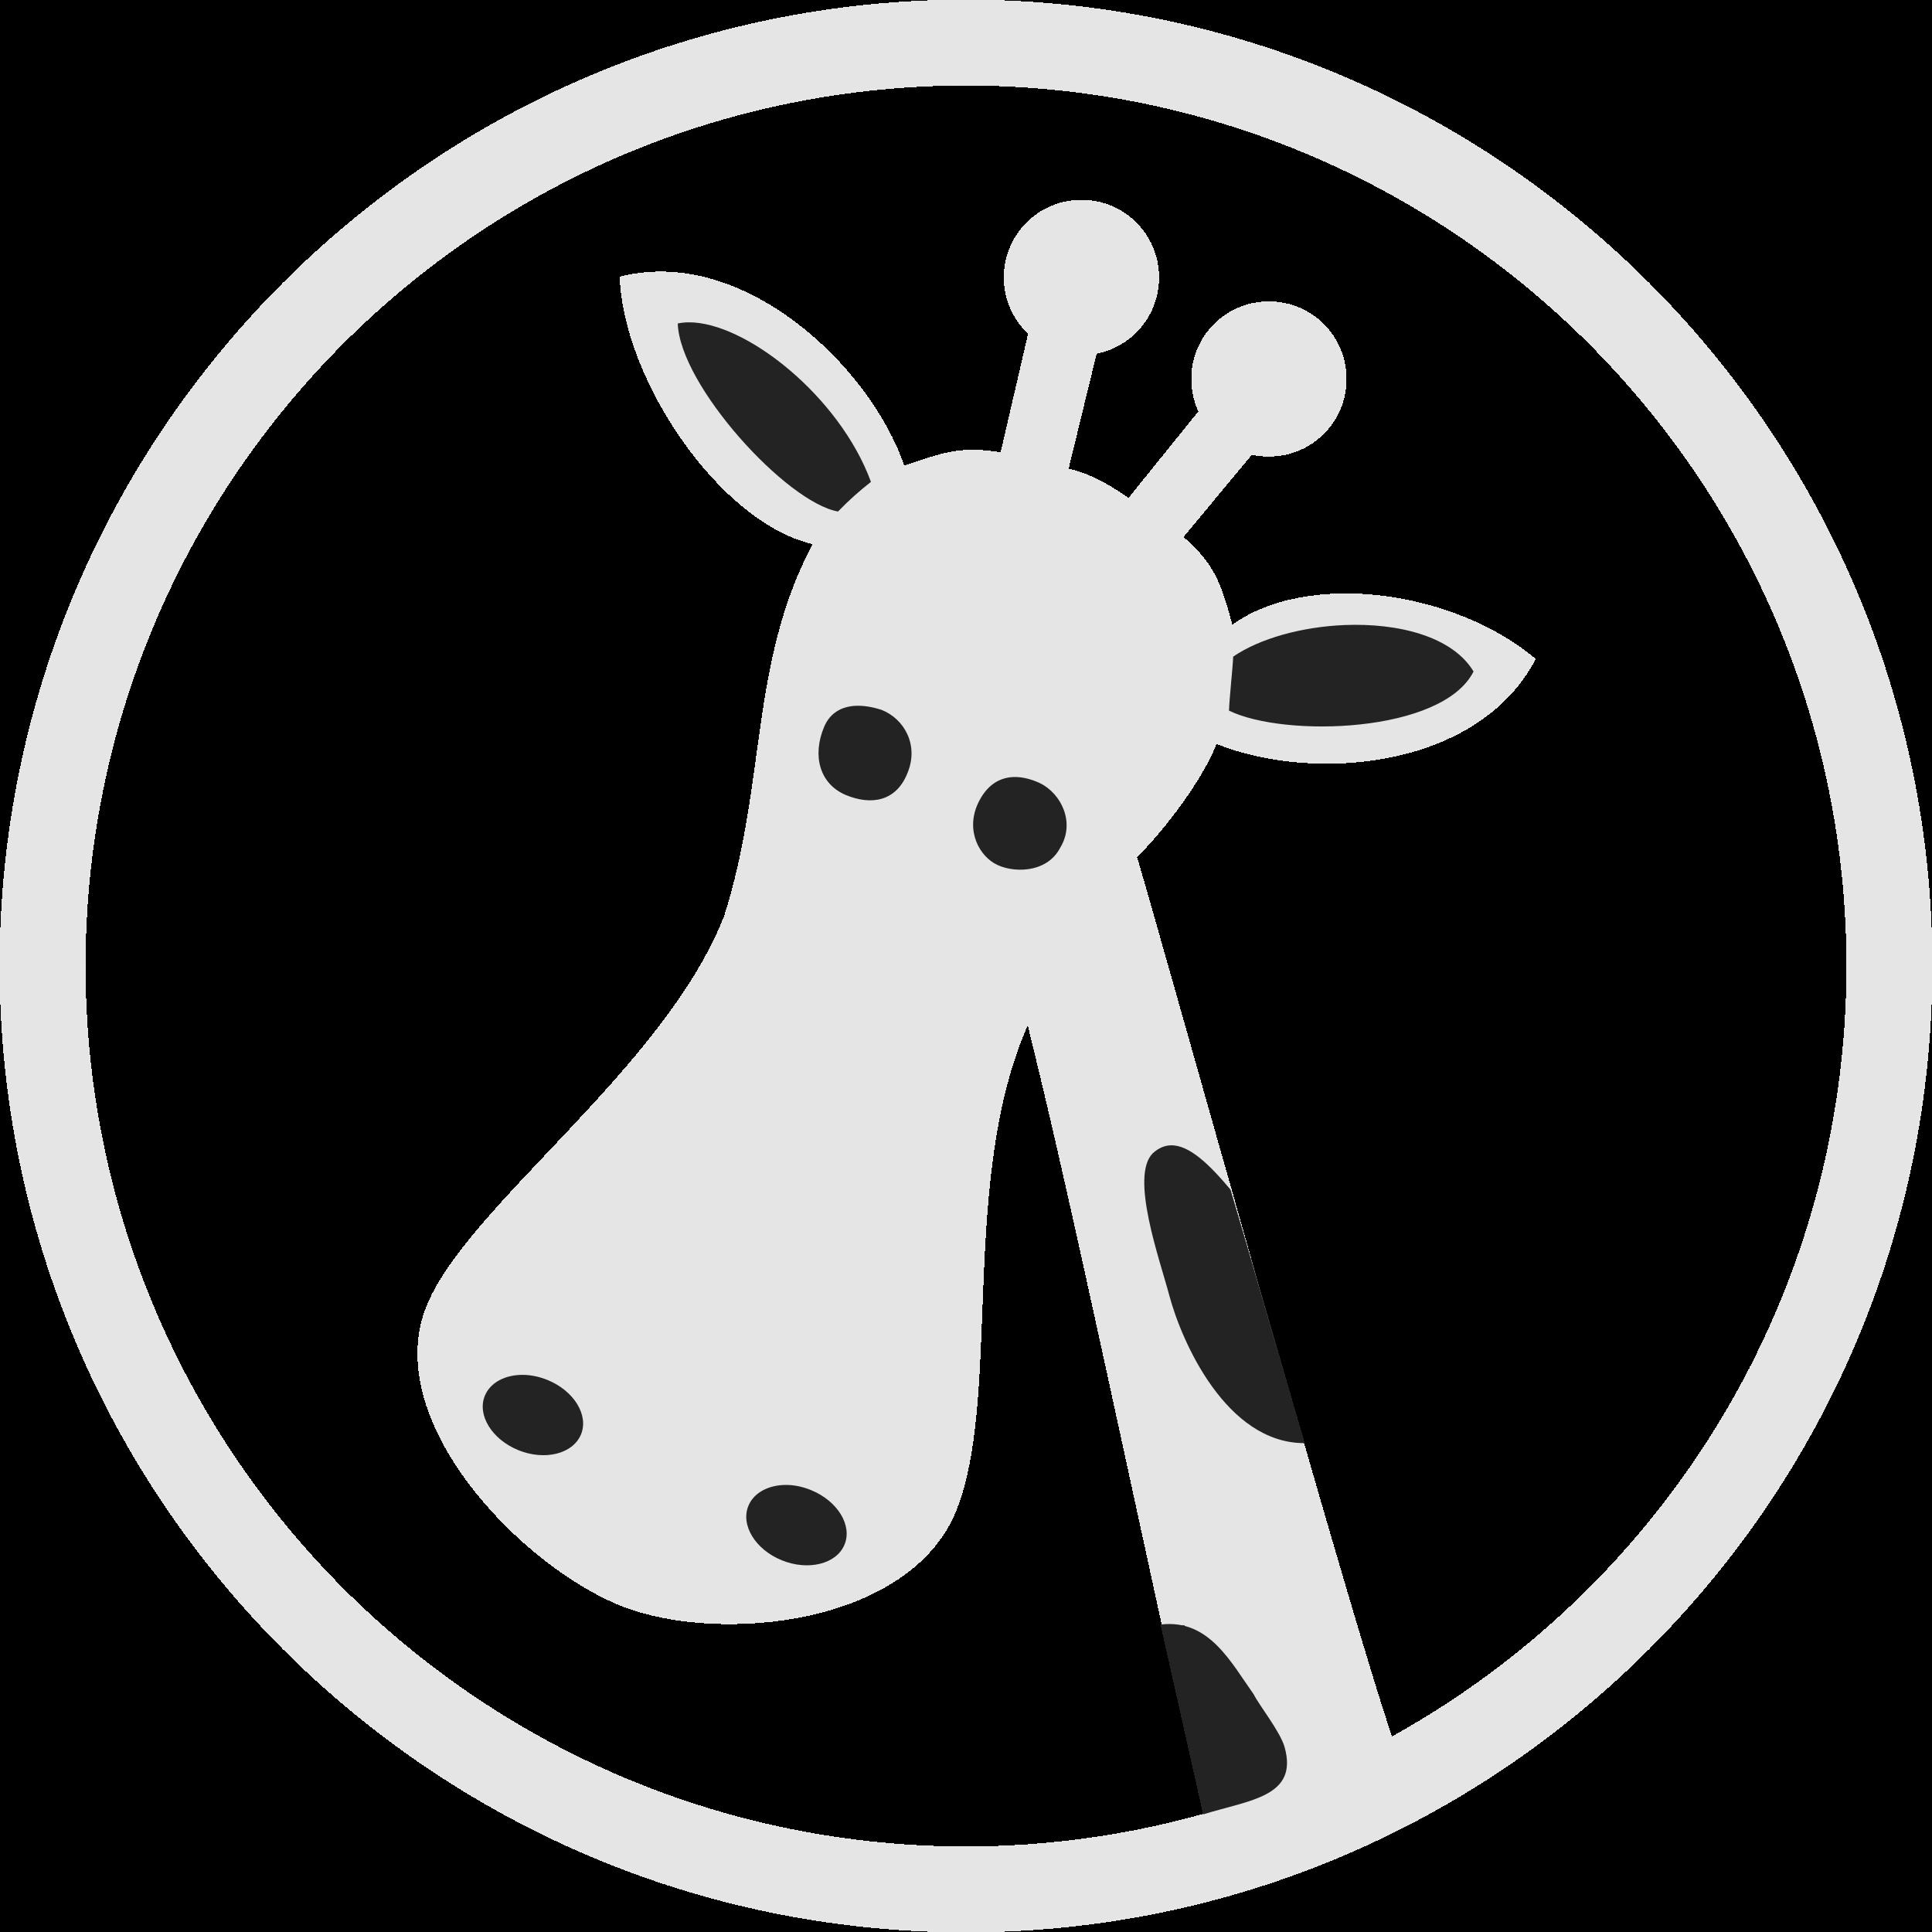 Clipart giraffe head. Clipartblack com animal free